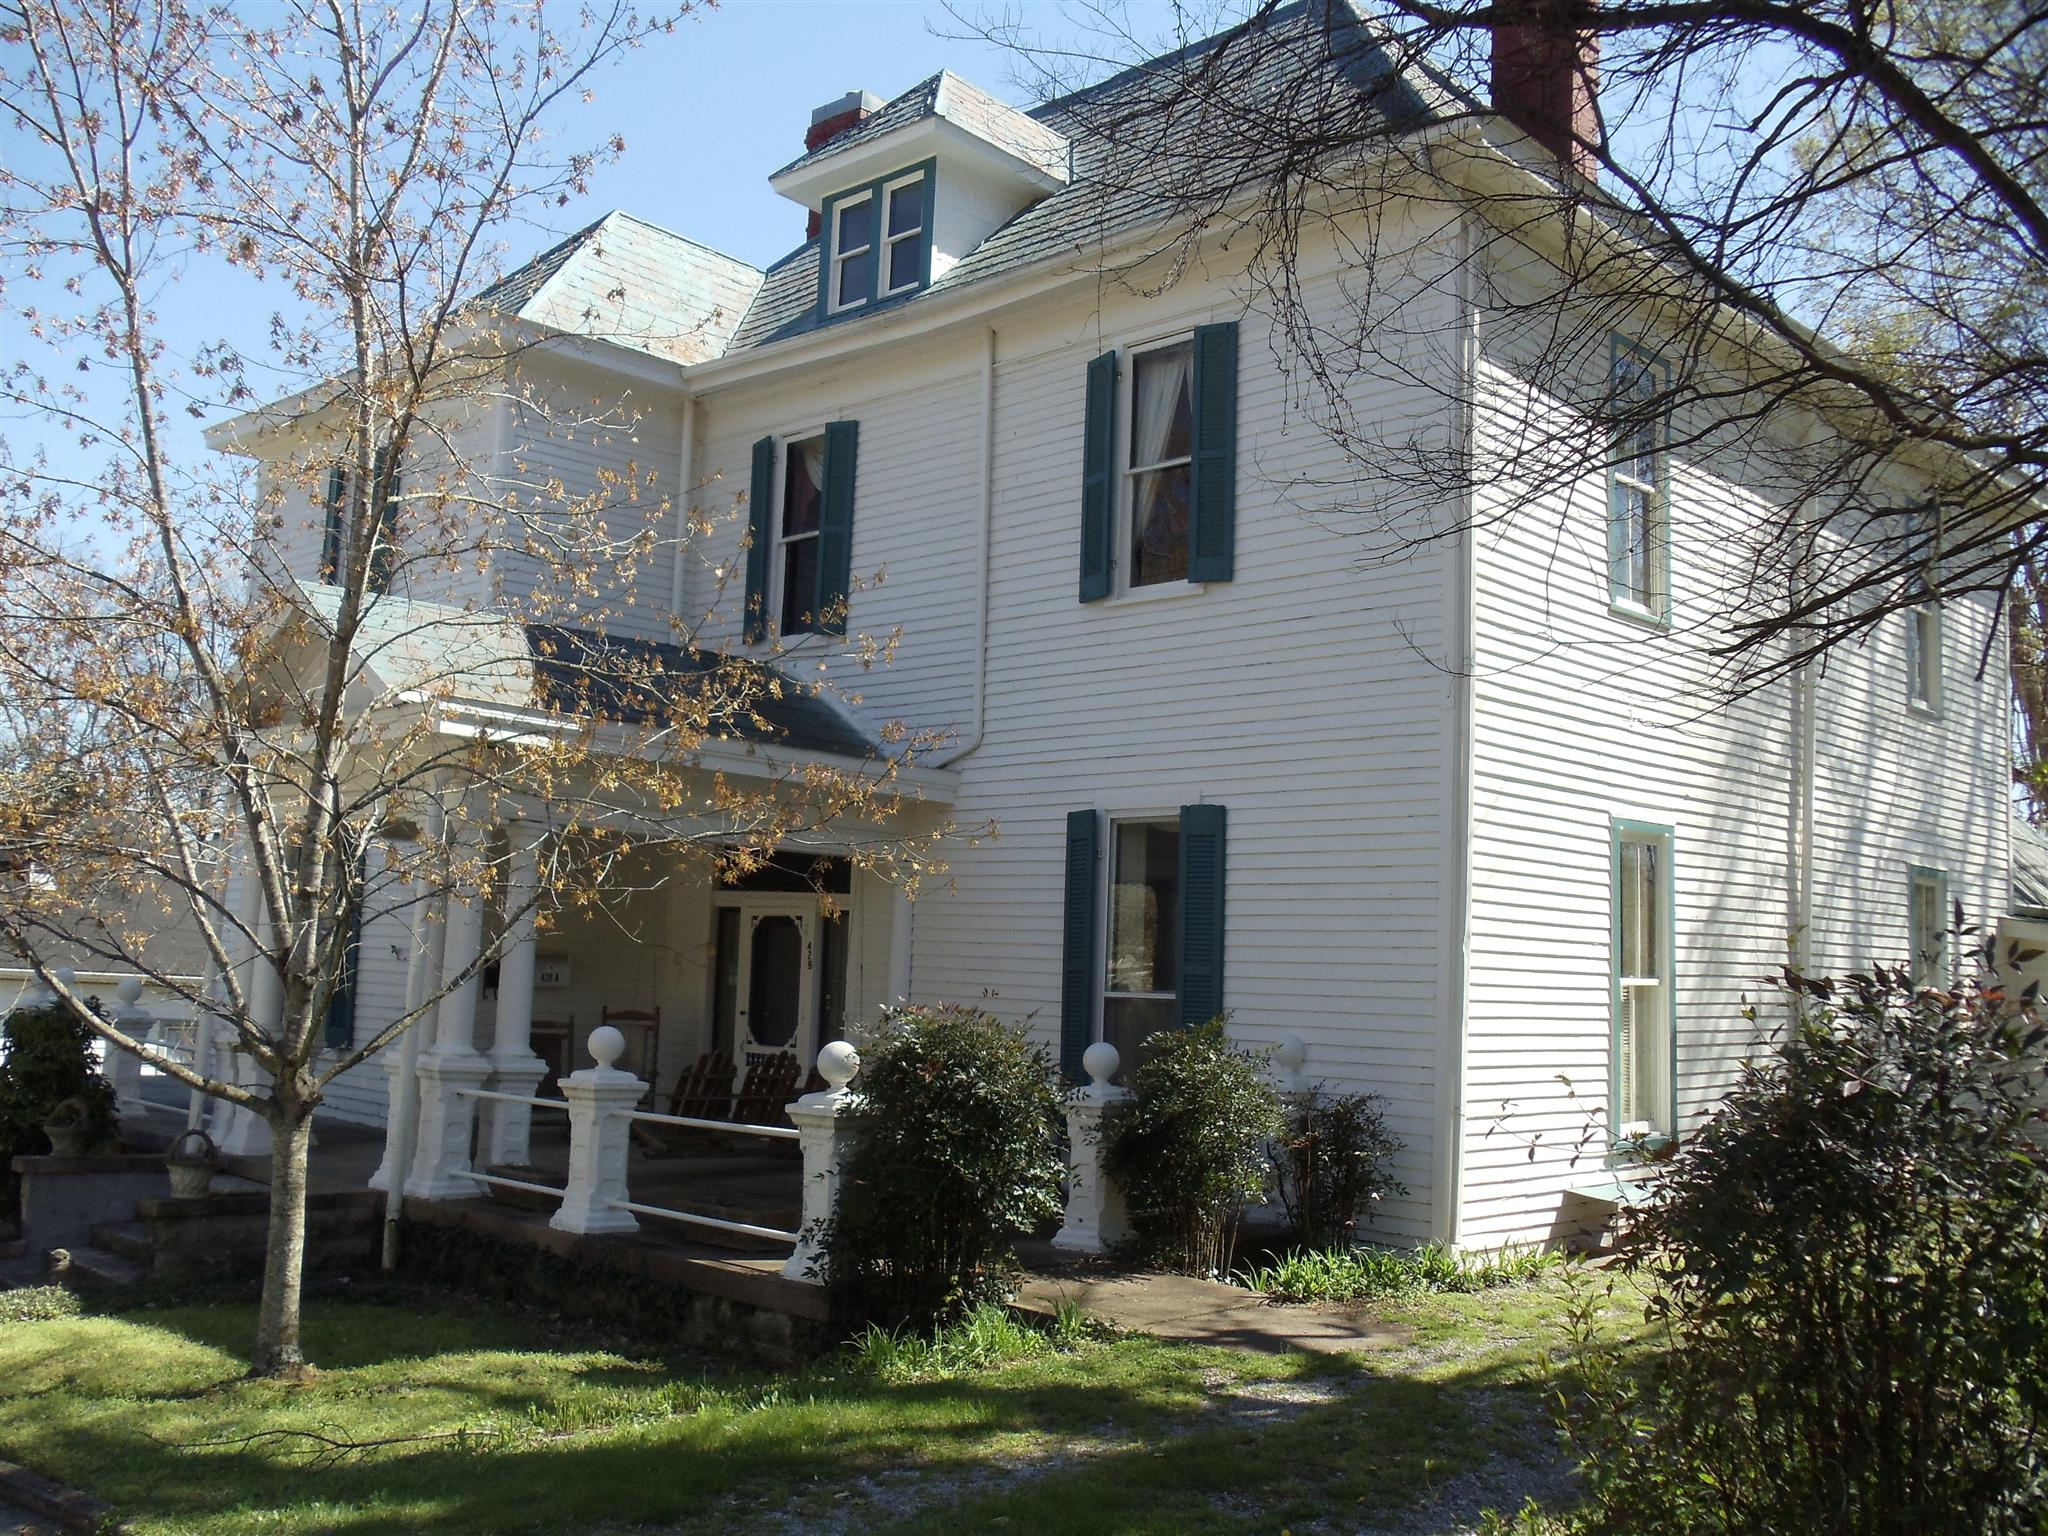 429 W Jefferson St, Pulaski, TN 38478 - Pulaski, TN real estate listing